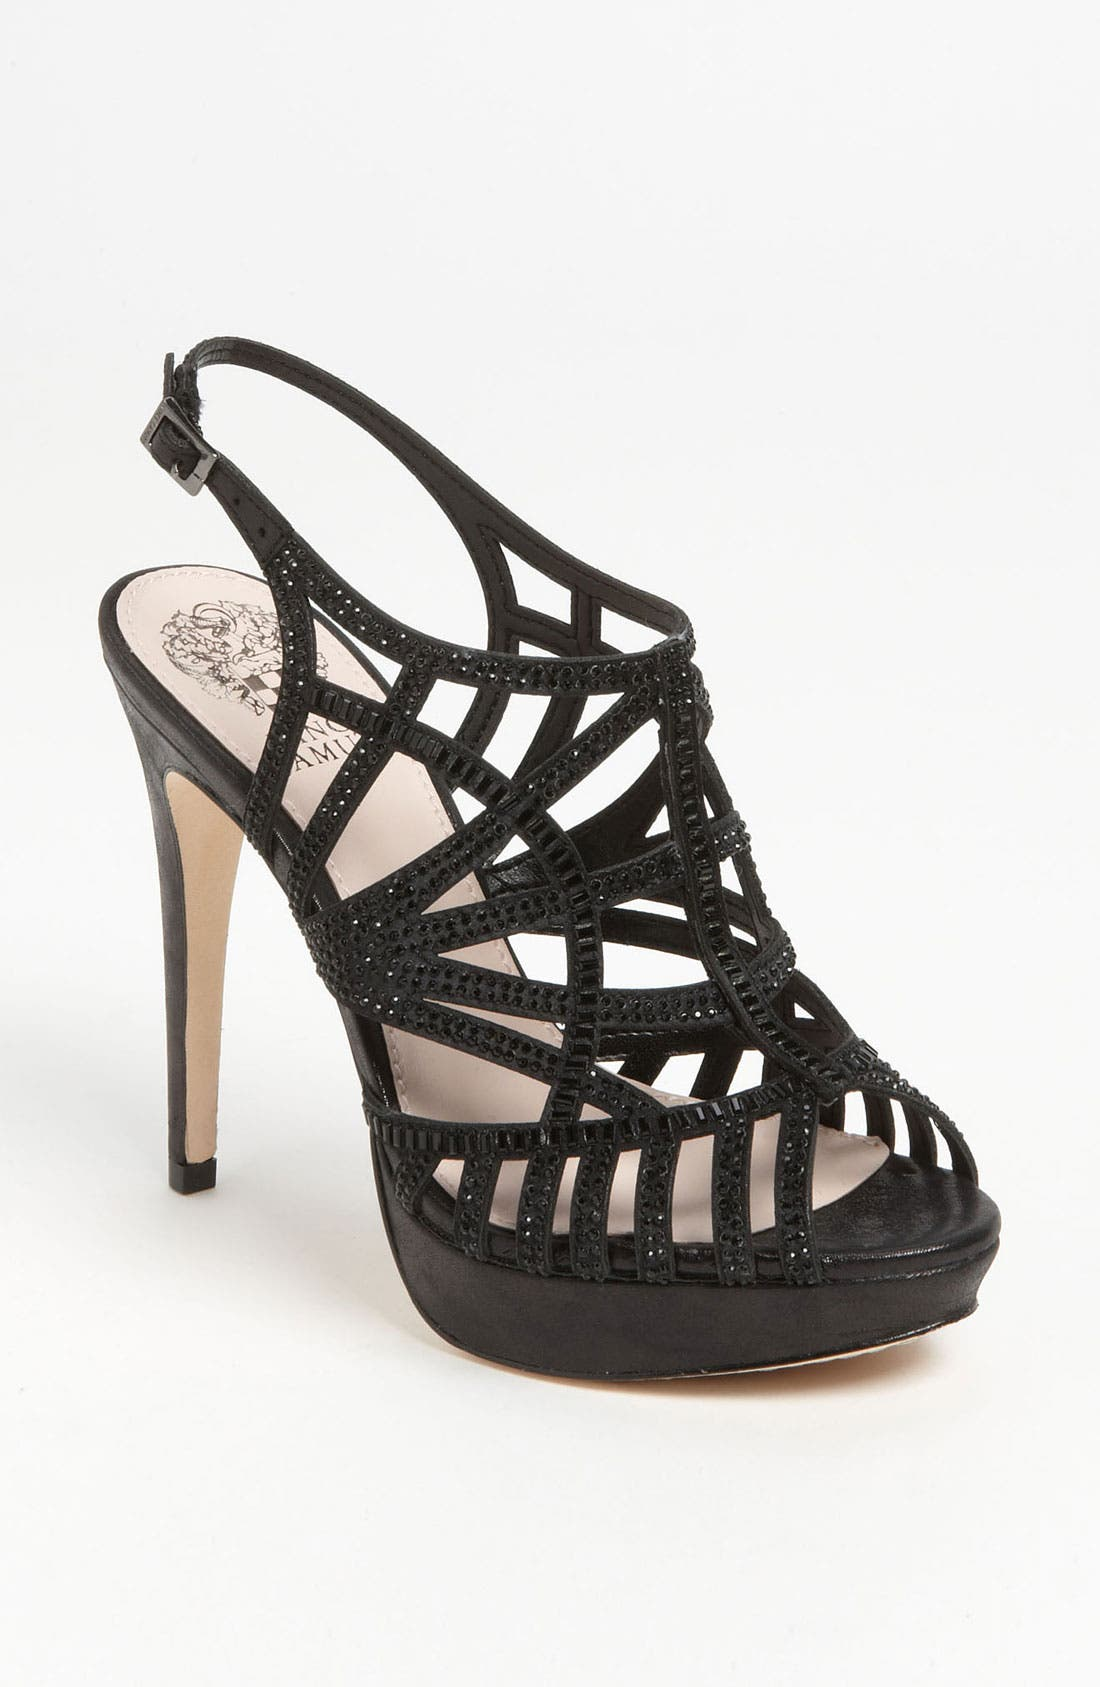 Alternate Image 1 Selected - Vince Camuto 'Janene' Sandal